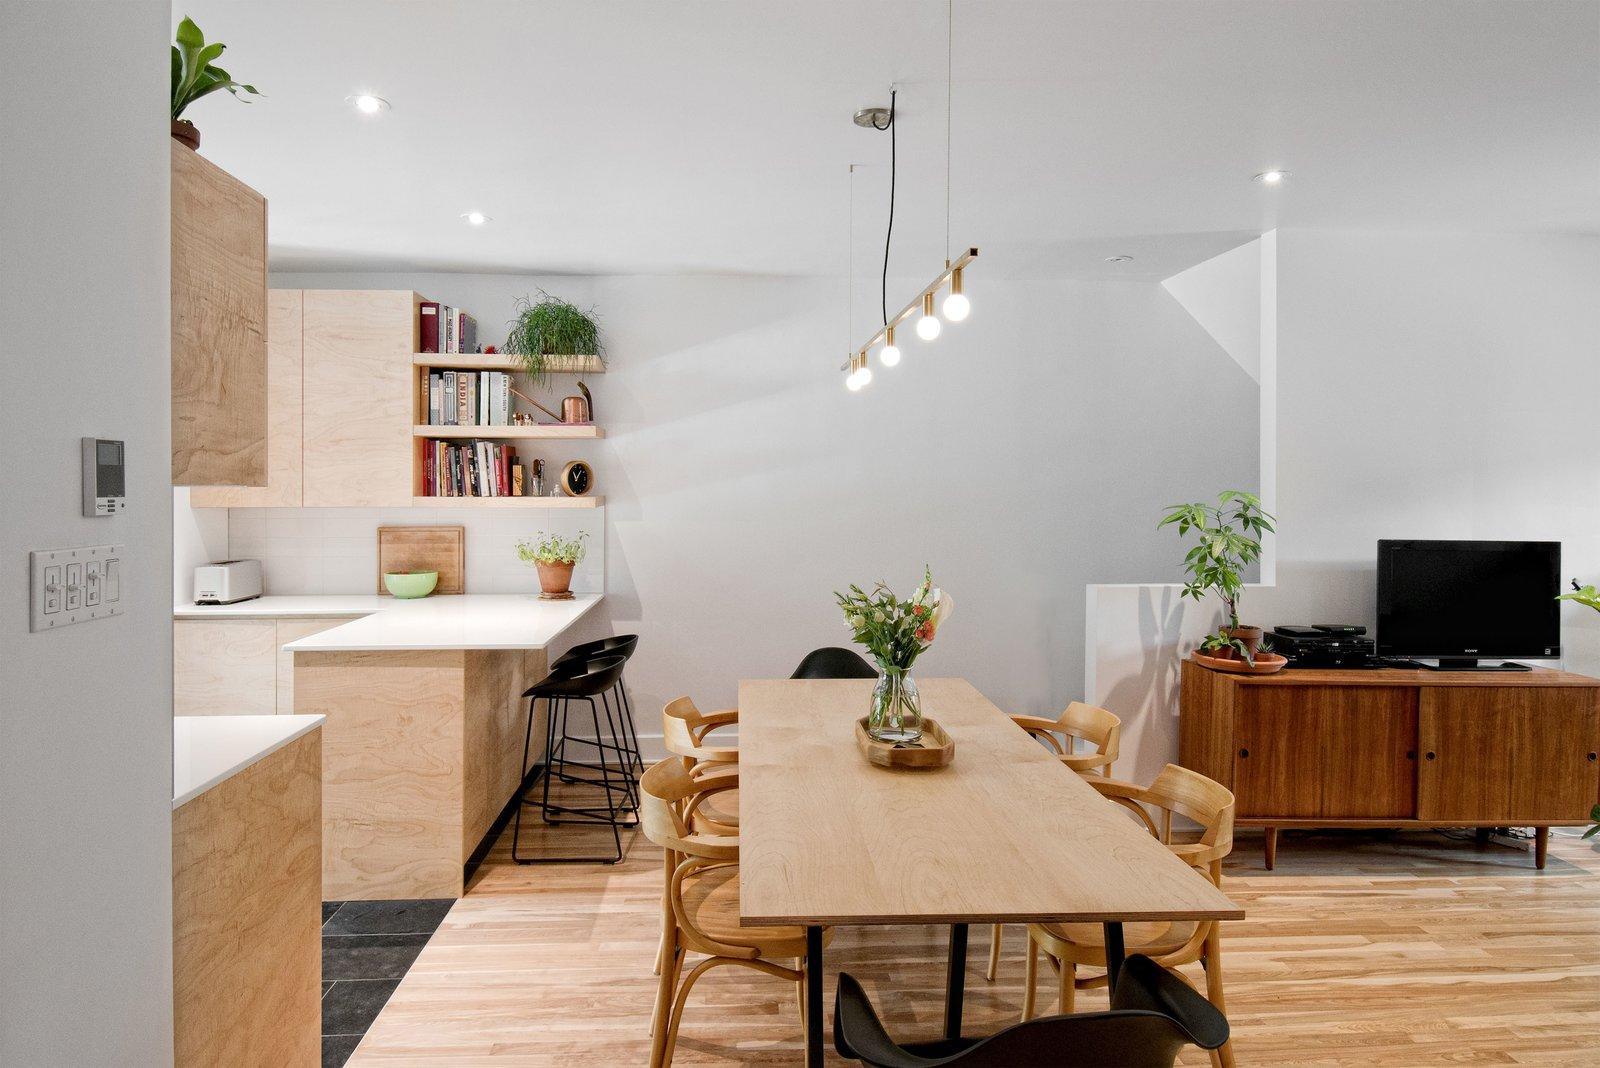 Wood Cabinet, Engineered Quartz Counter, Light Hardwood Floor, Subway Tile Backsplashe, Slate Floor, Pendant Lighting, Undermount Sink, Ceiling Lighting, Stools, Table, Chair, Kitchen, and Lamps  Fabre Residence